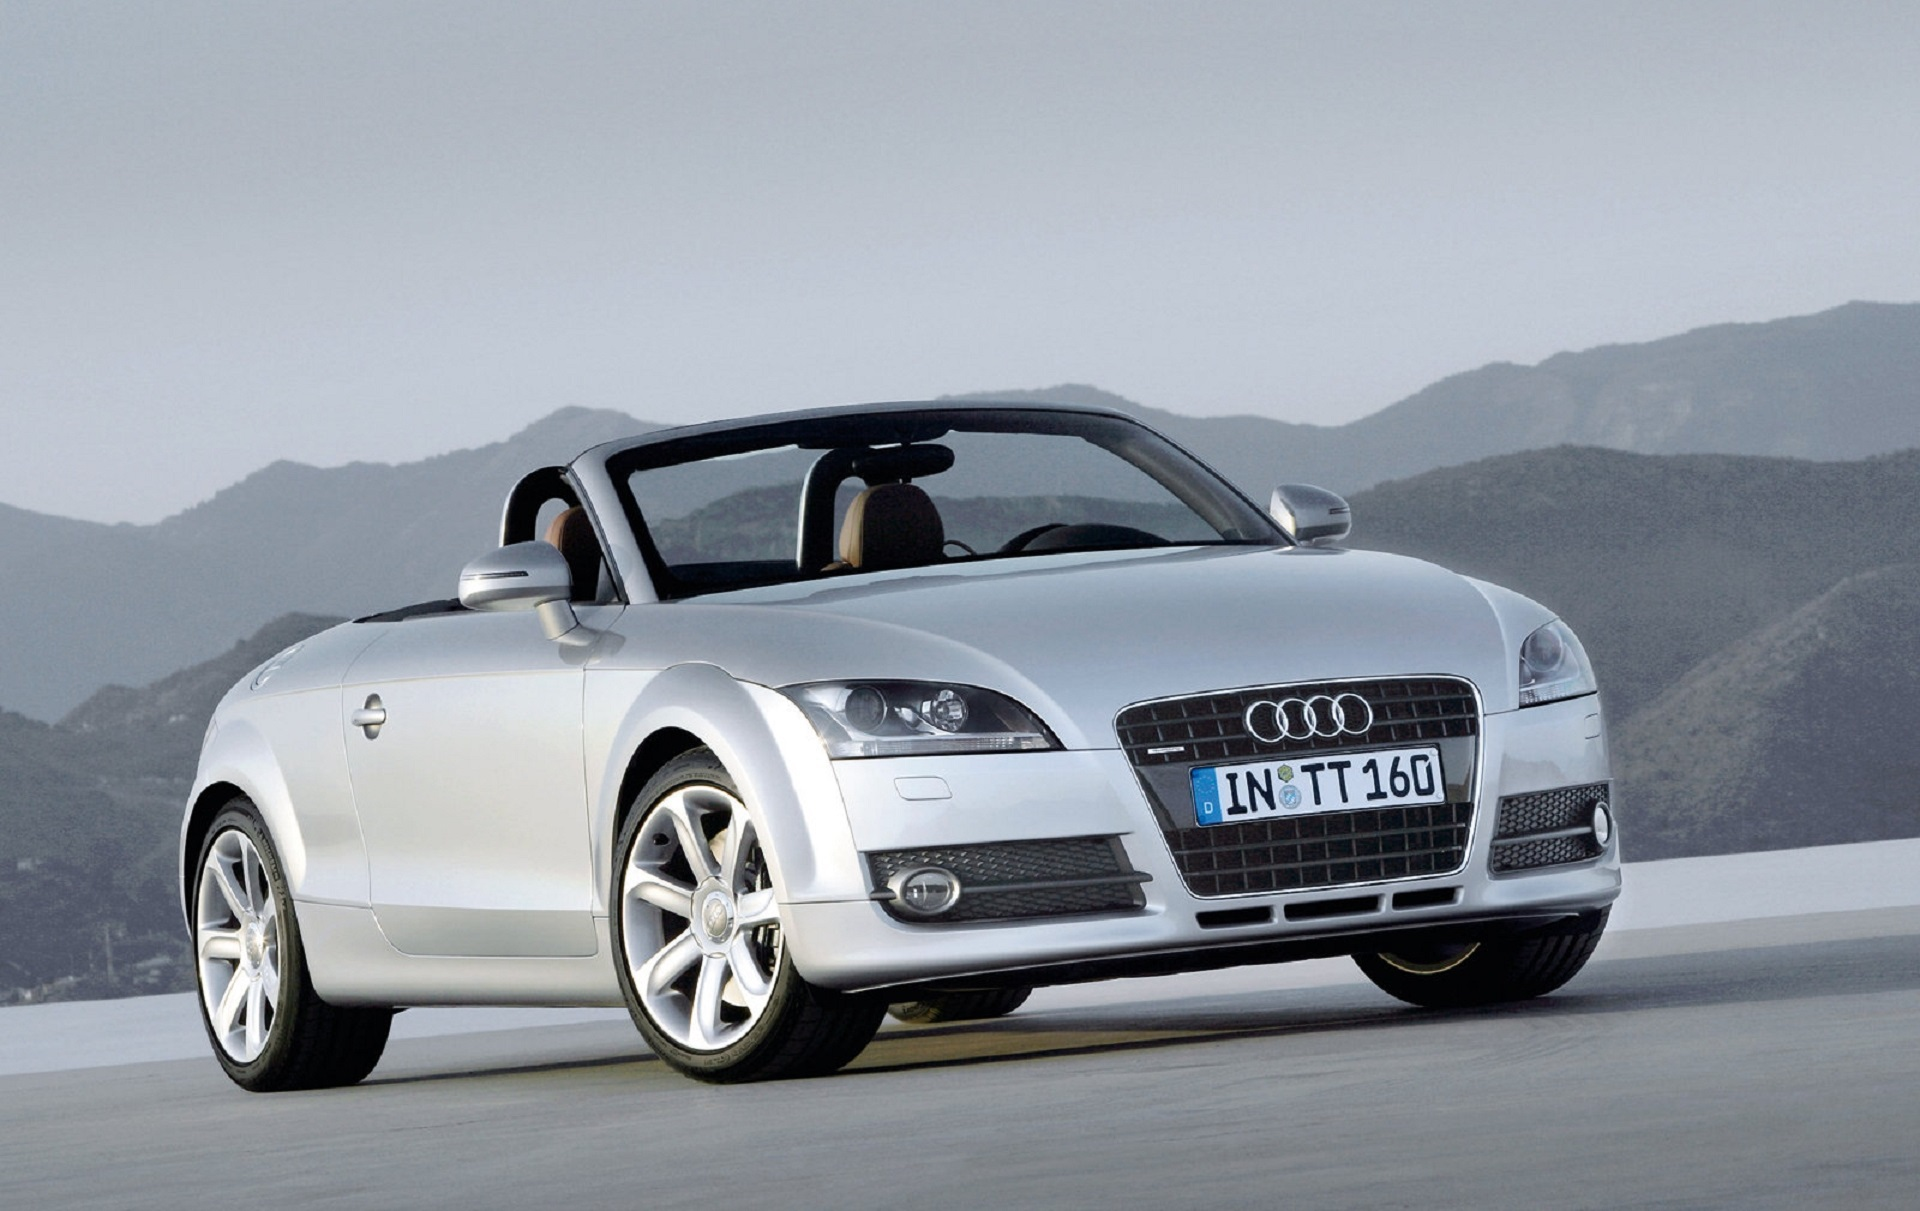 Audi Tt Roadster Background